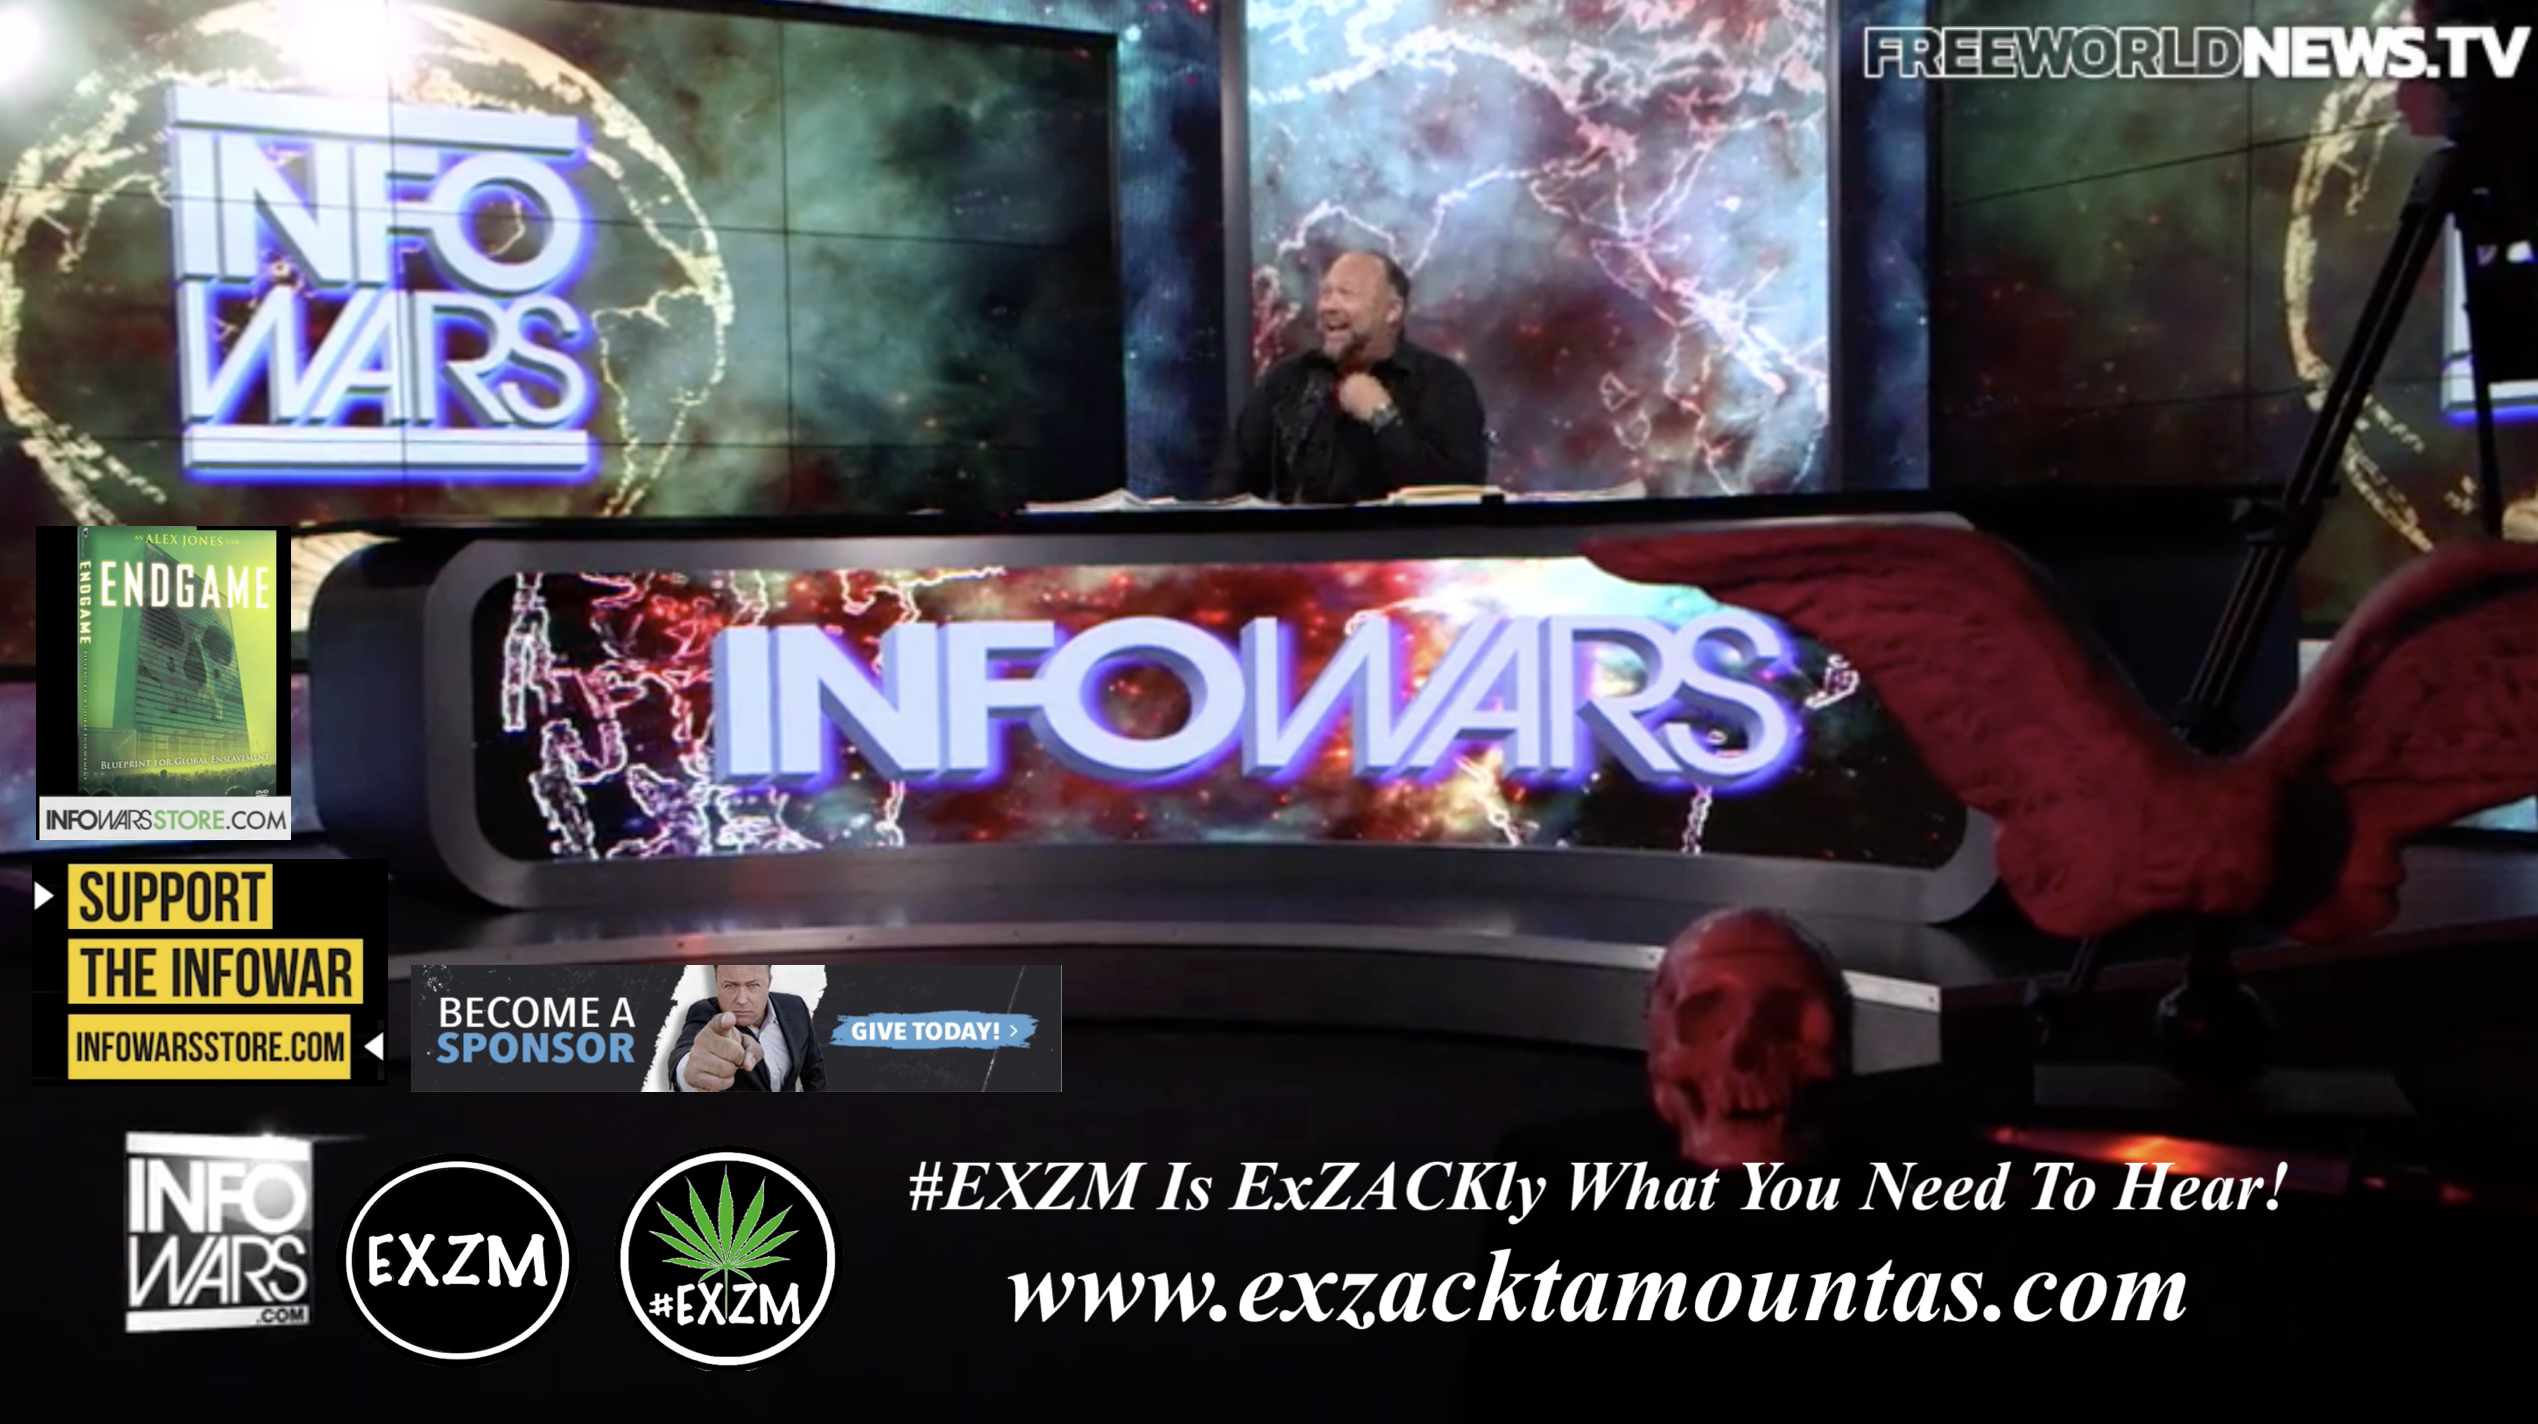 Alex Jones Live In Infowars Studio Human Skull Angel Wings Dagger Free World News TV EXZM Zack Mount October 20th 2021 copy